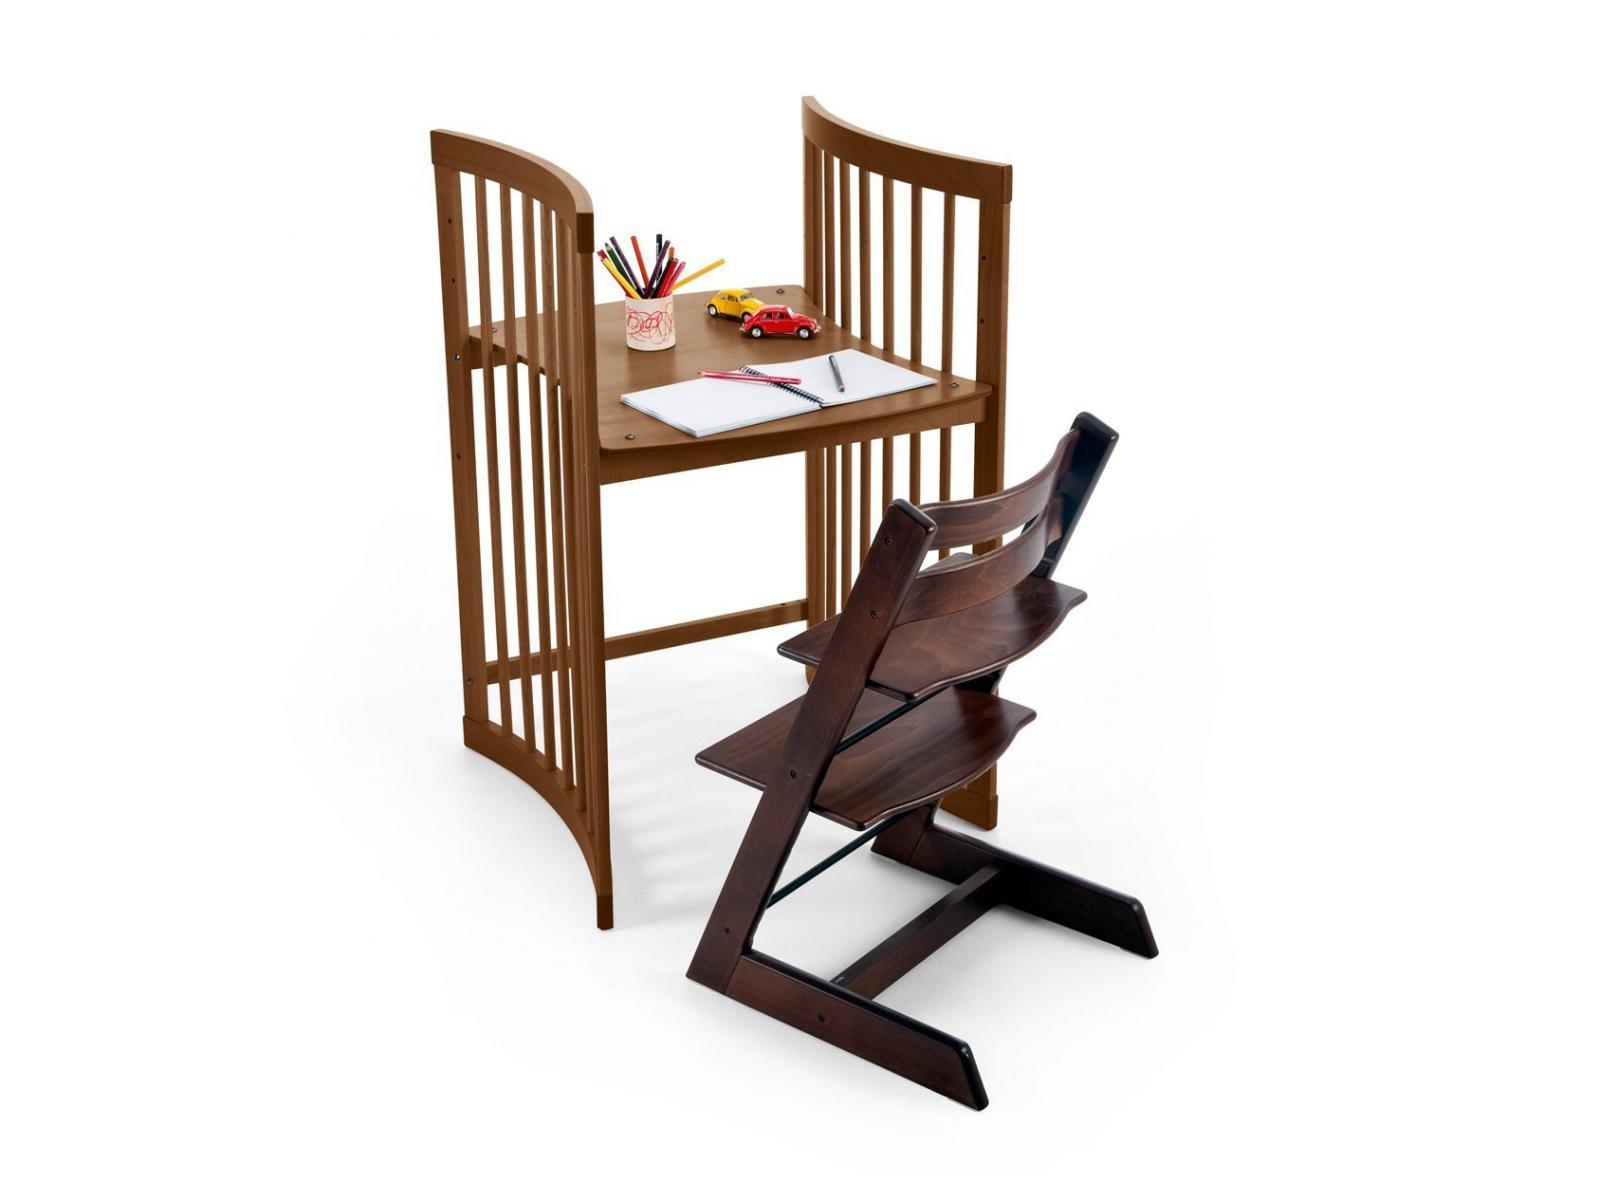 Stokke table a langer avec 2 bacs en platisque 2 Table langer stokke